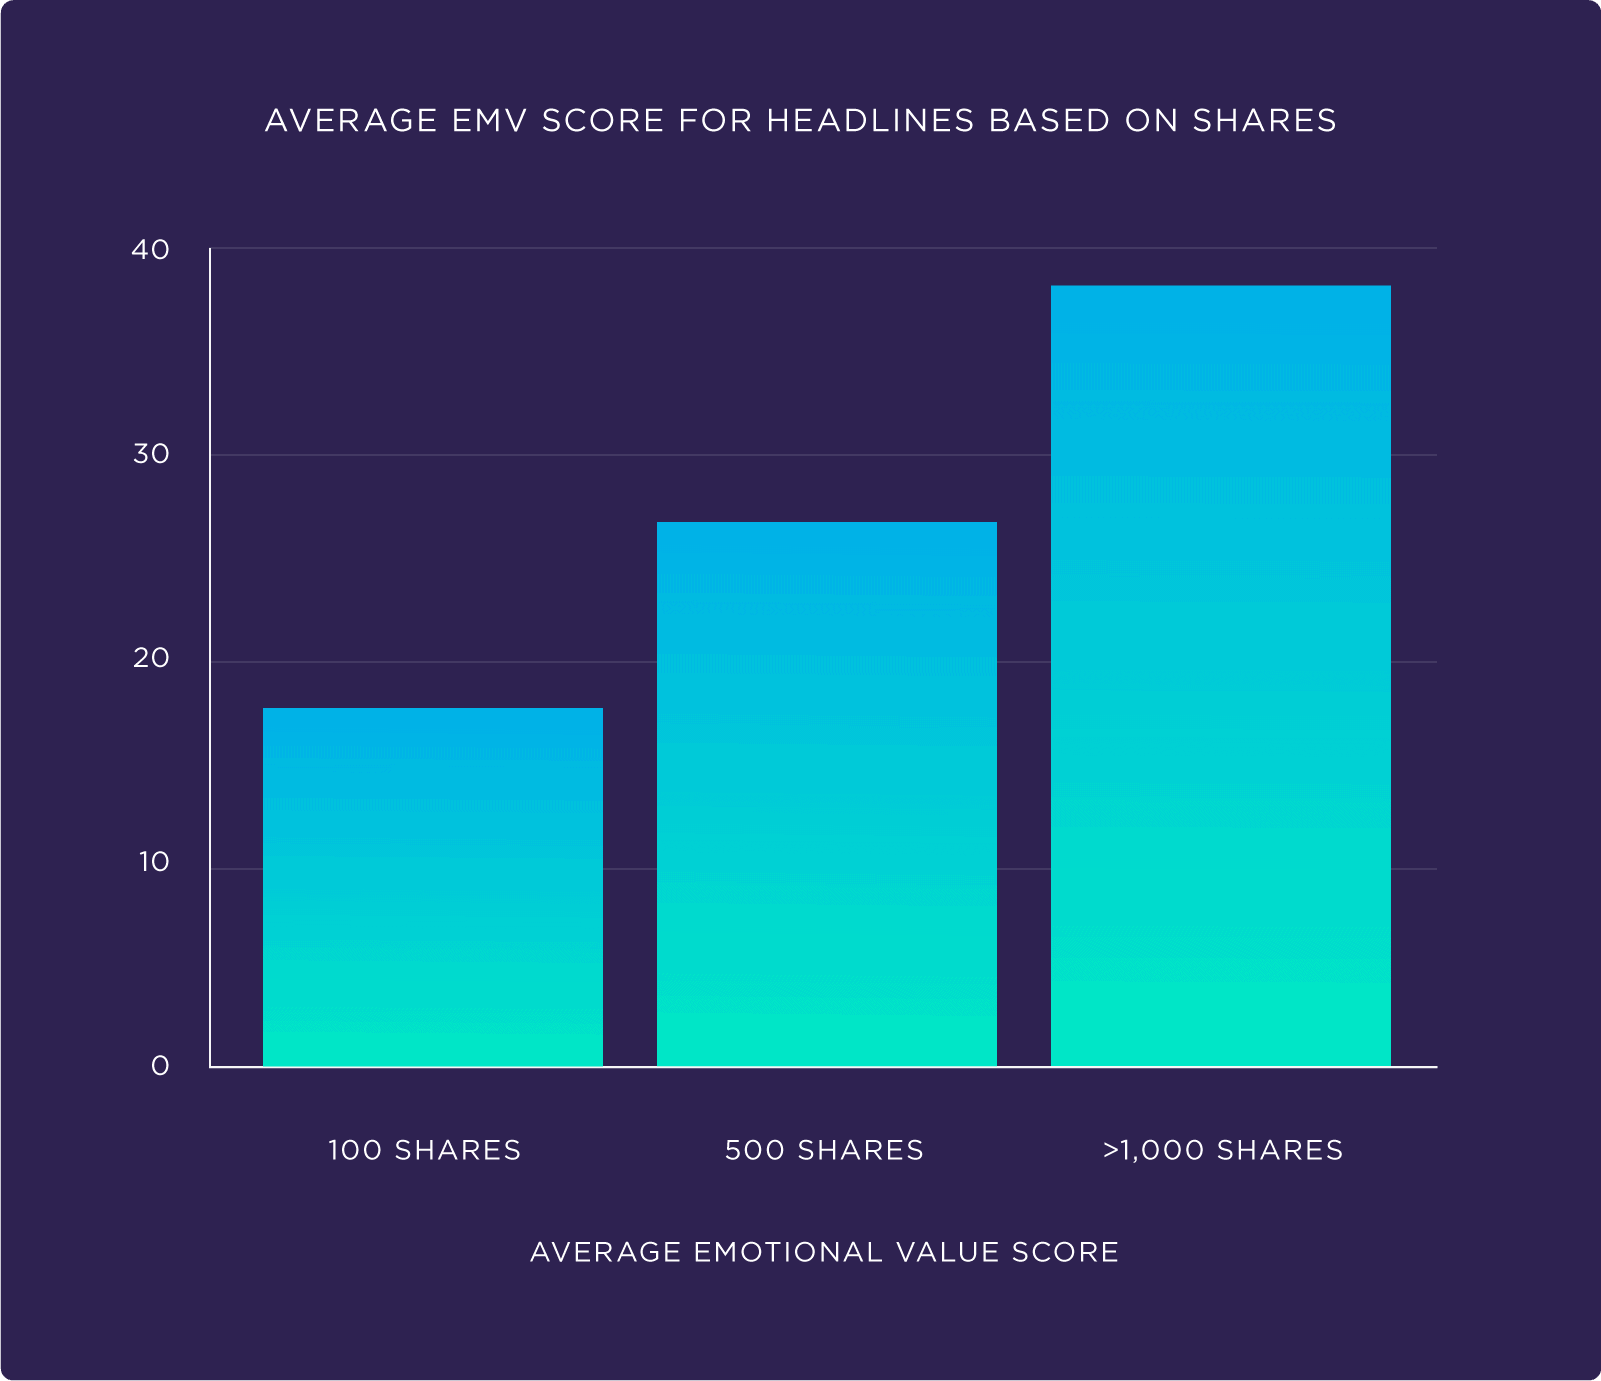 Average EMV score for headlines based on shares